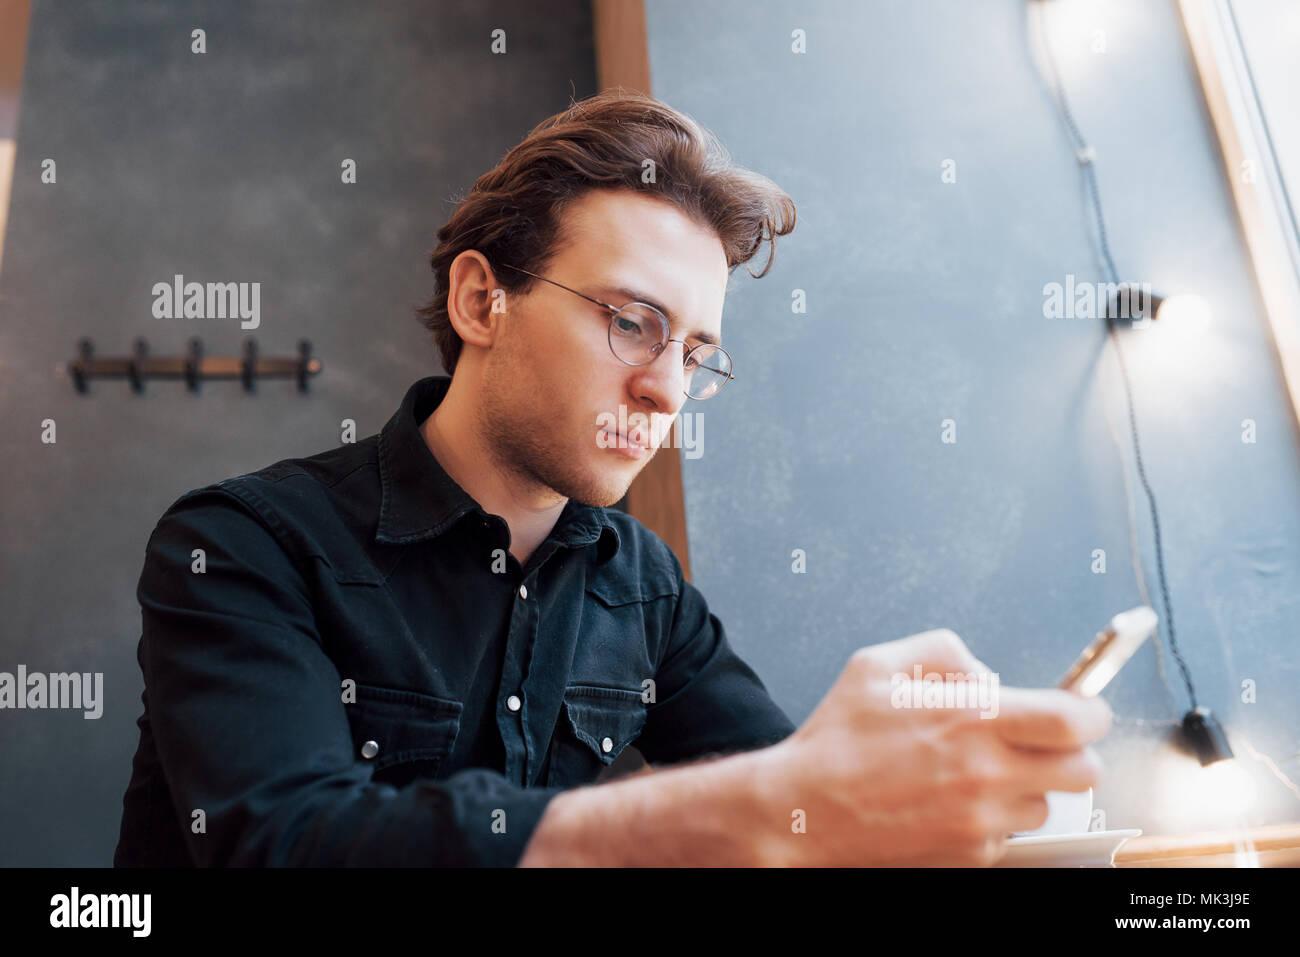 Portrait gut aussehender bärtiger Mann Kopfhörer video Mobiltelefon moderne Loft Studio. Mann in vintage Stuhl, Smartphone und entspannend. Horizontale, Film, Bokeh Stockbild